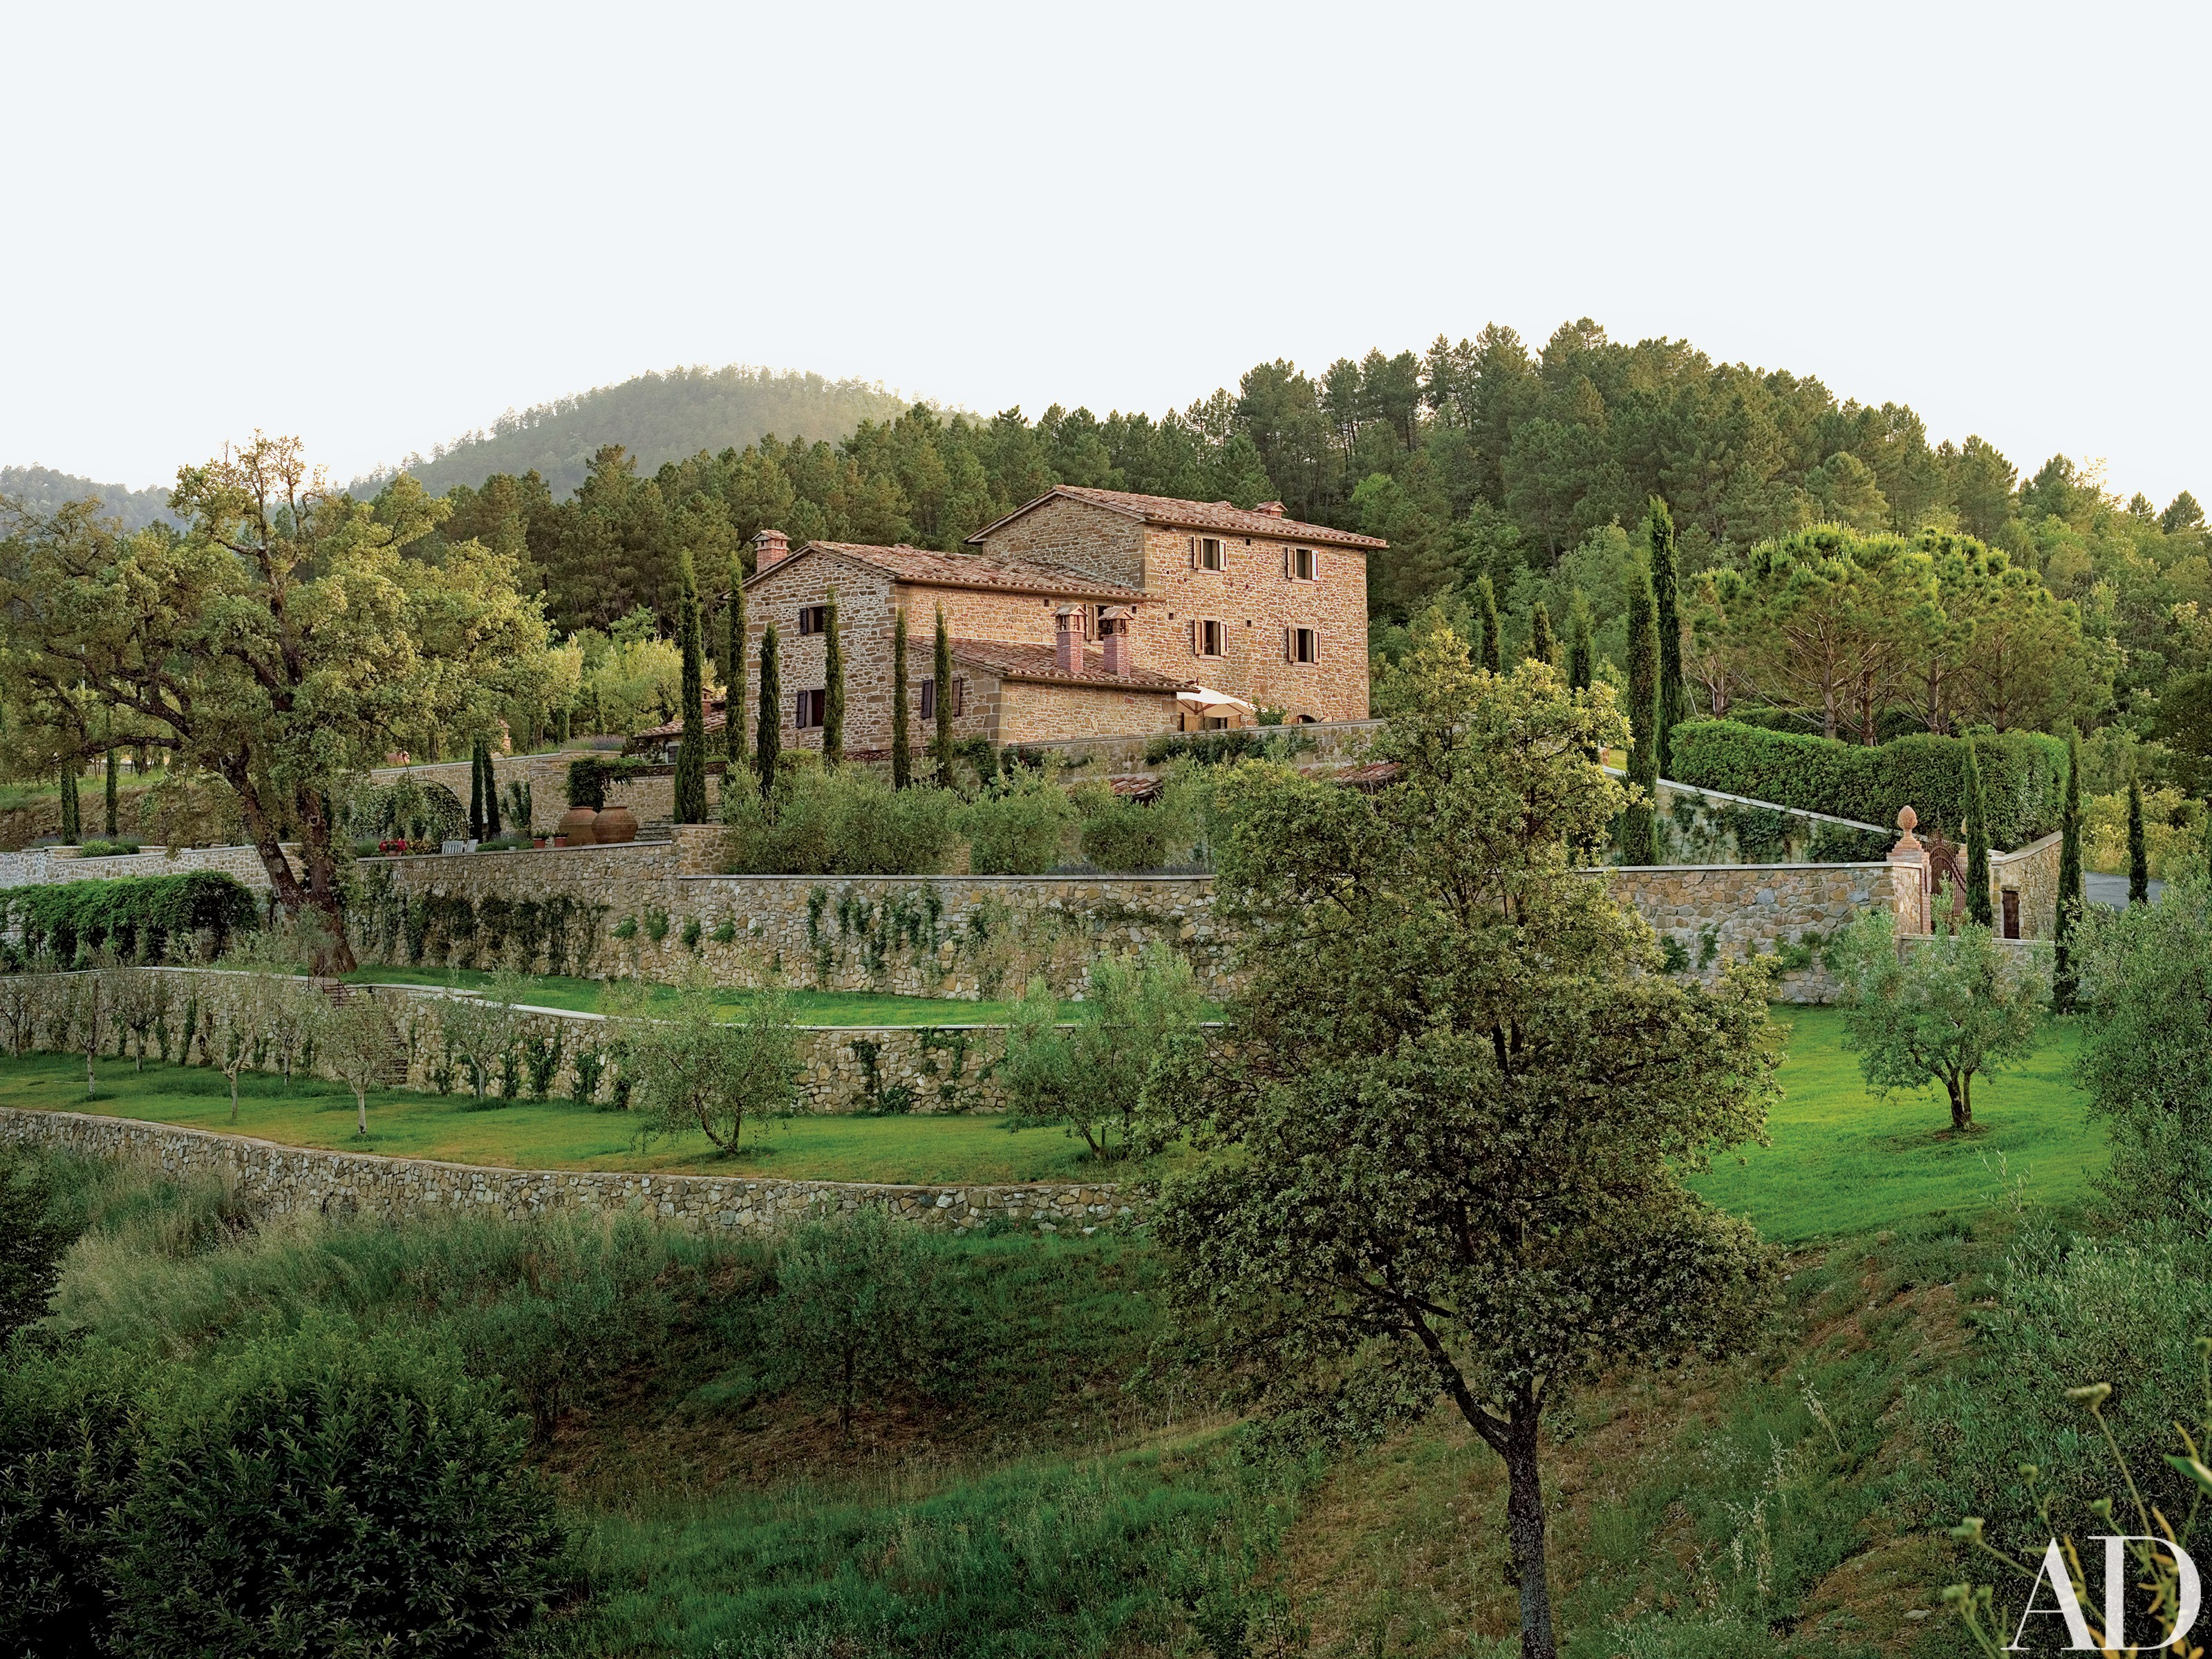 Architect Nicholas Risley Restores an Italian Farmhouse 3200x2400